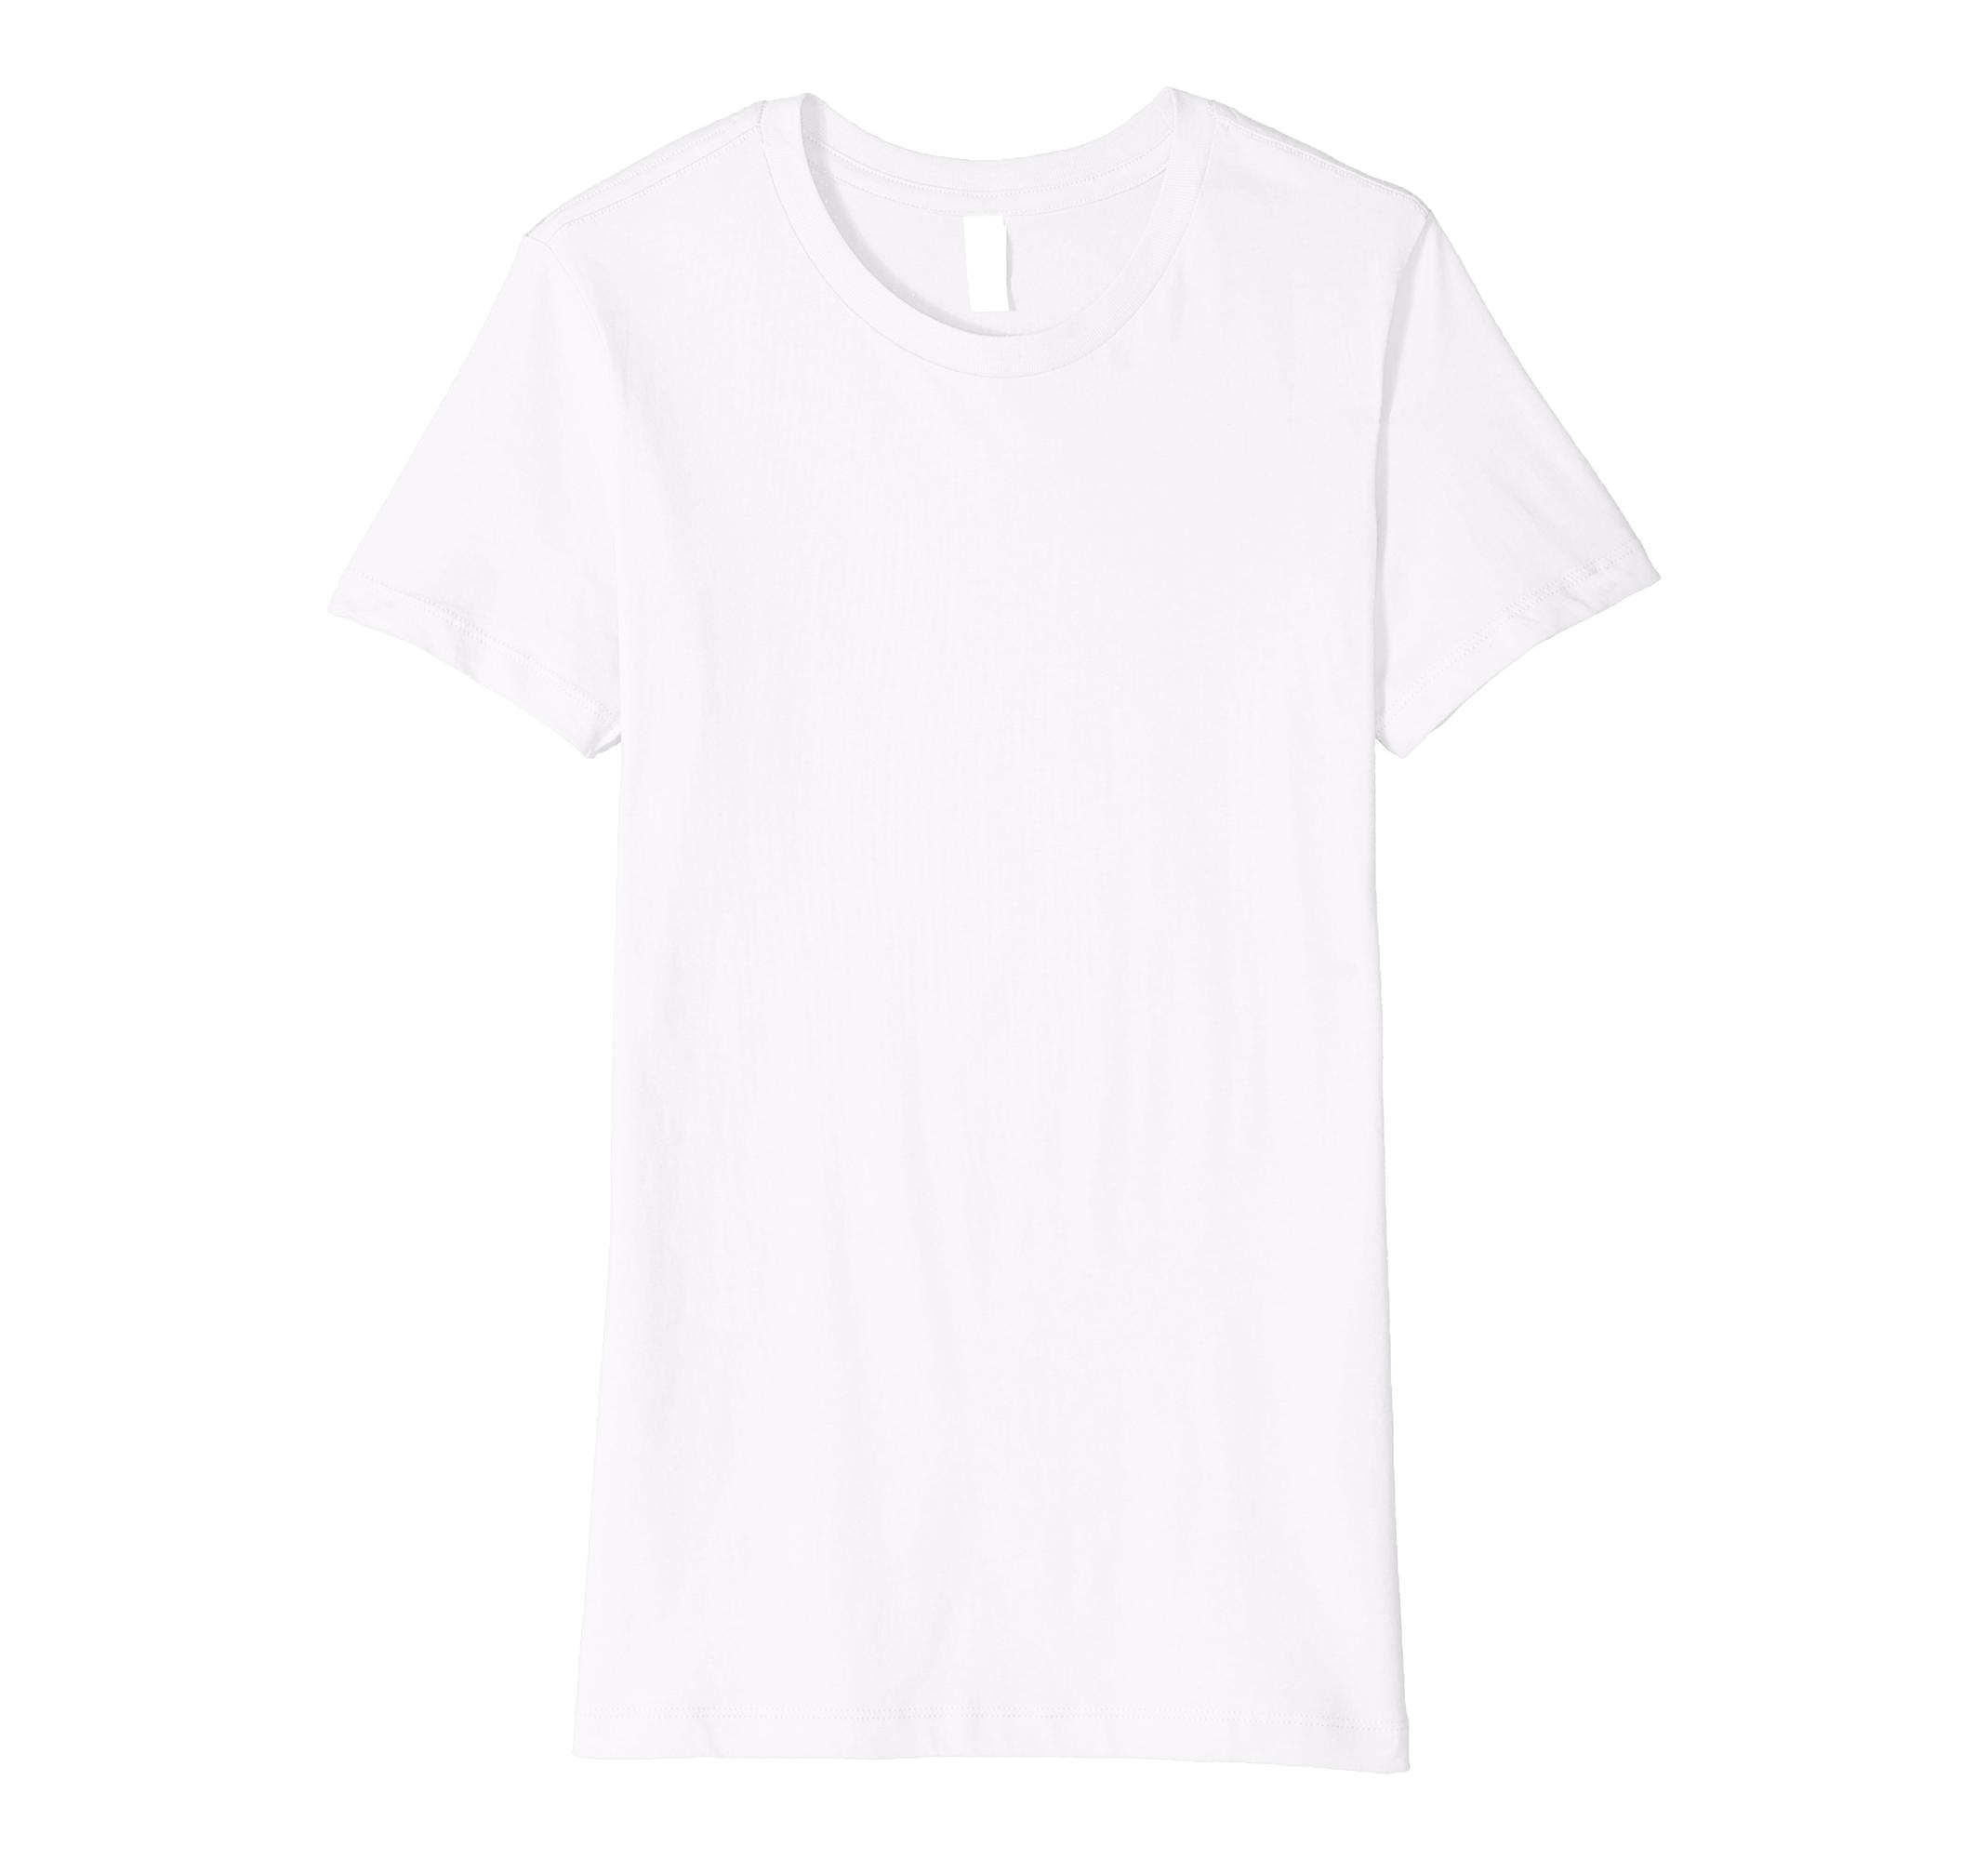 Kids Boys Girls Polo Black T Shirt Designer Plain School T-Shirts PE Top 3-13 Yr